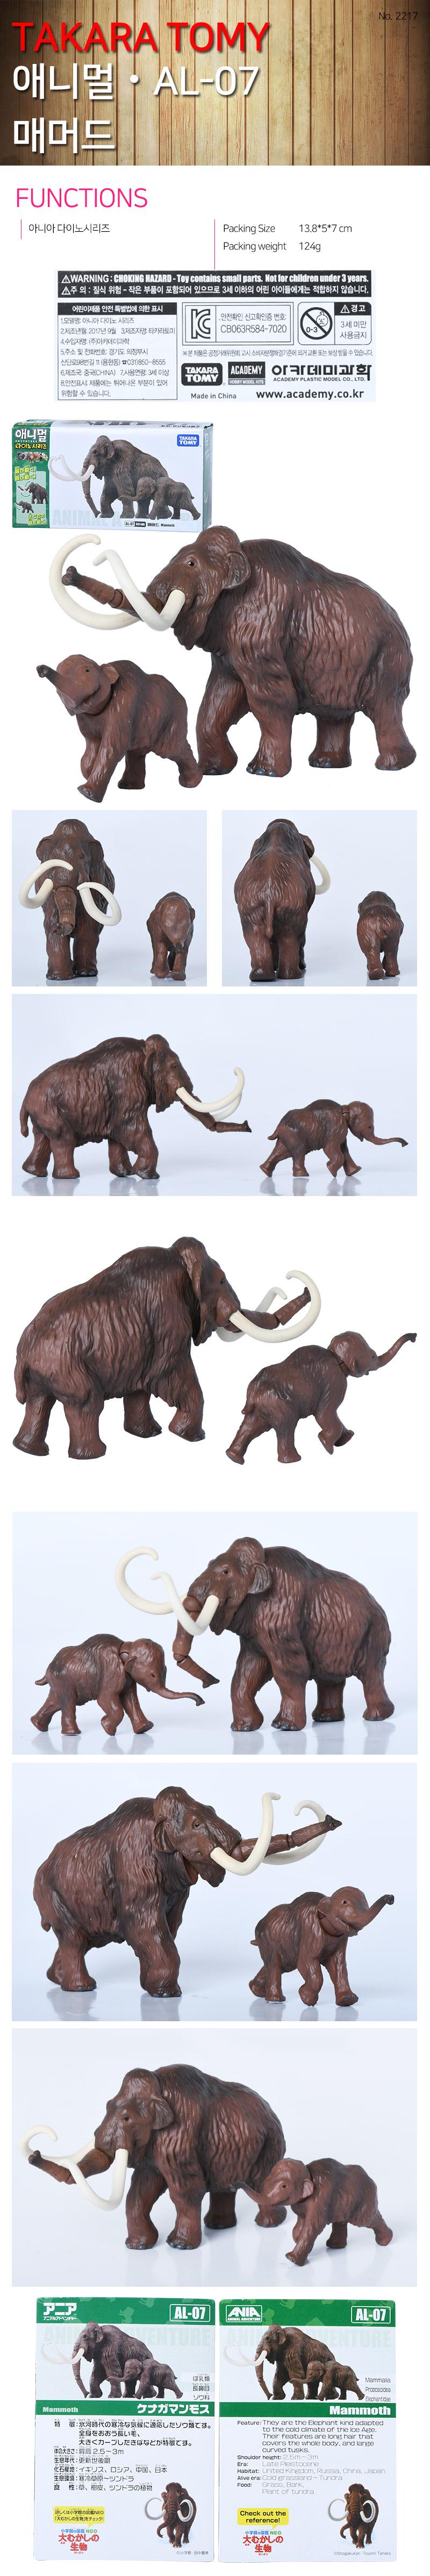 Ania AL-07 Mammoth parent and child